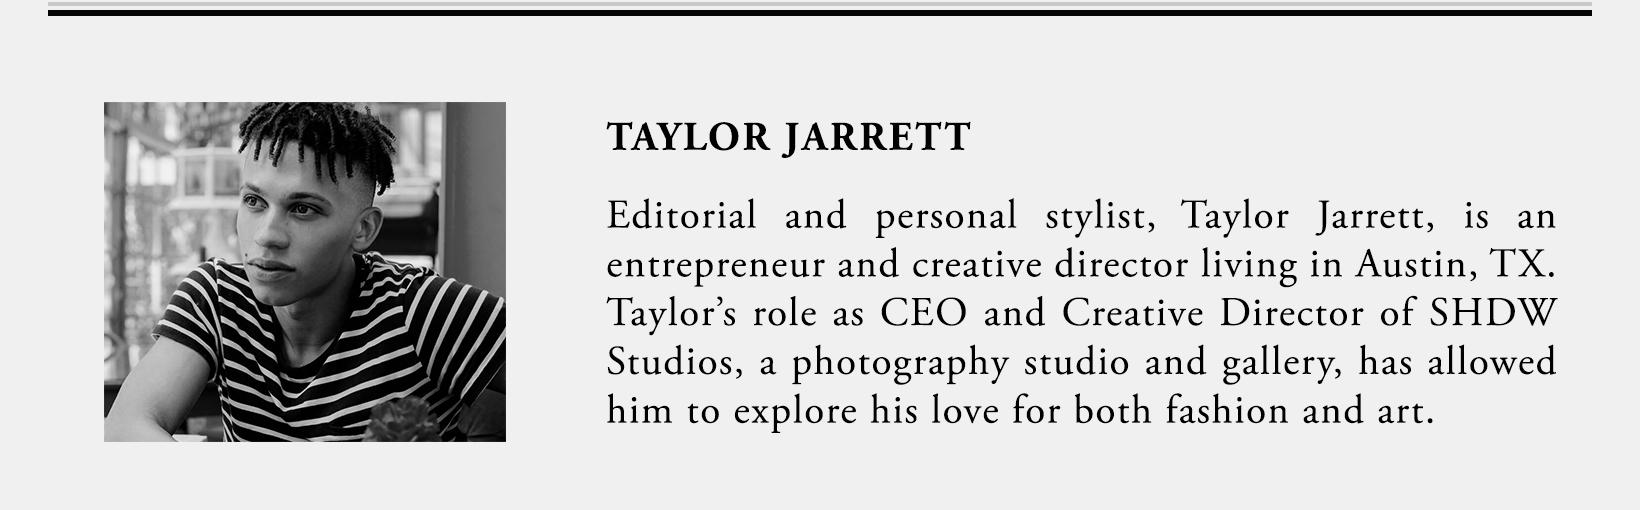 sharp_TaylorJarrett_Byline